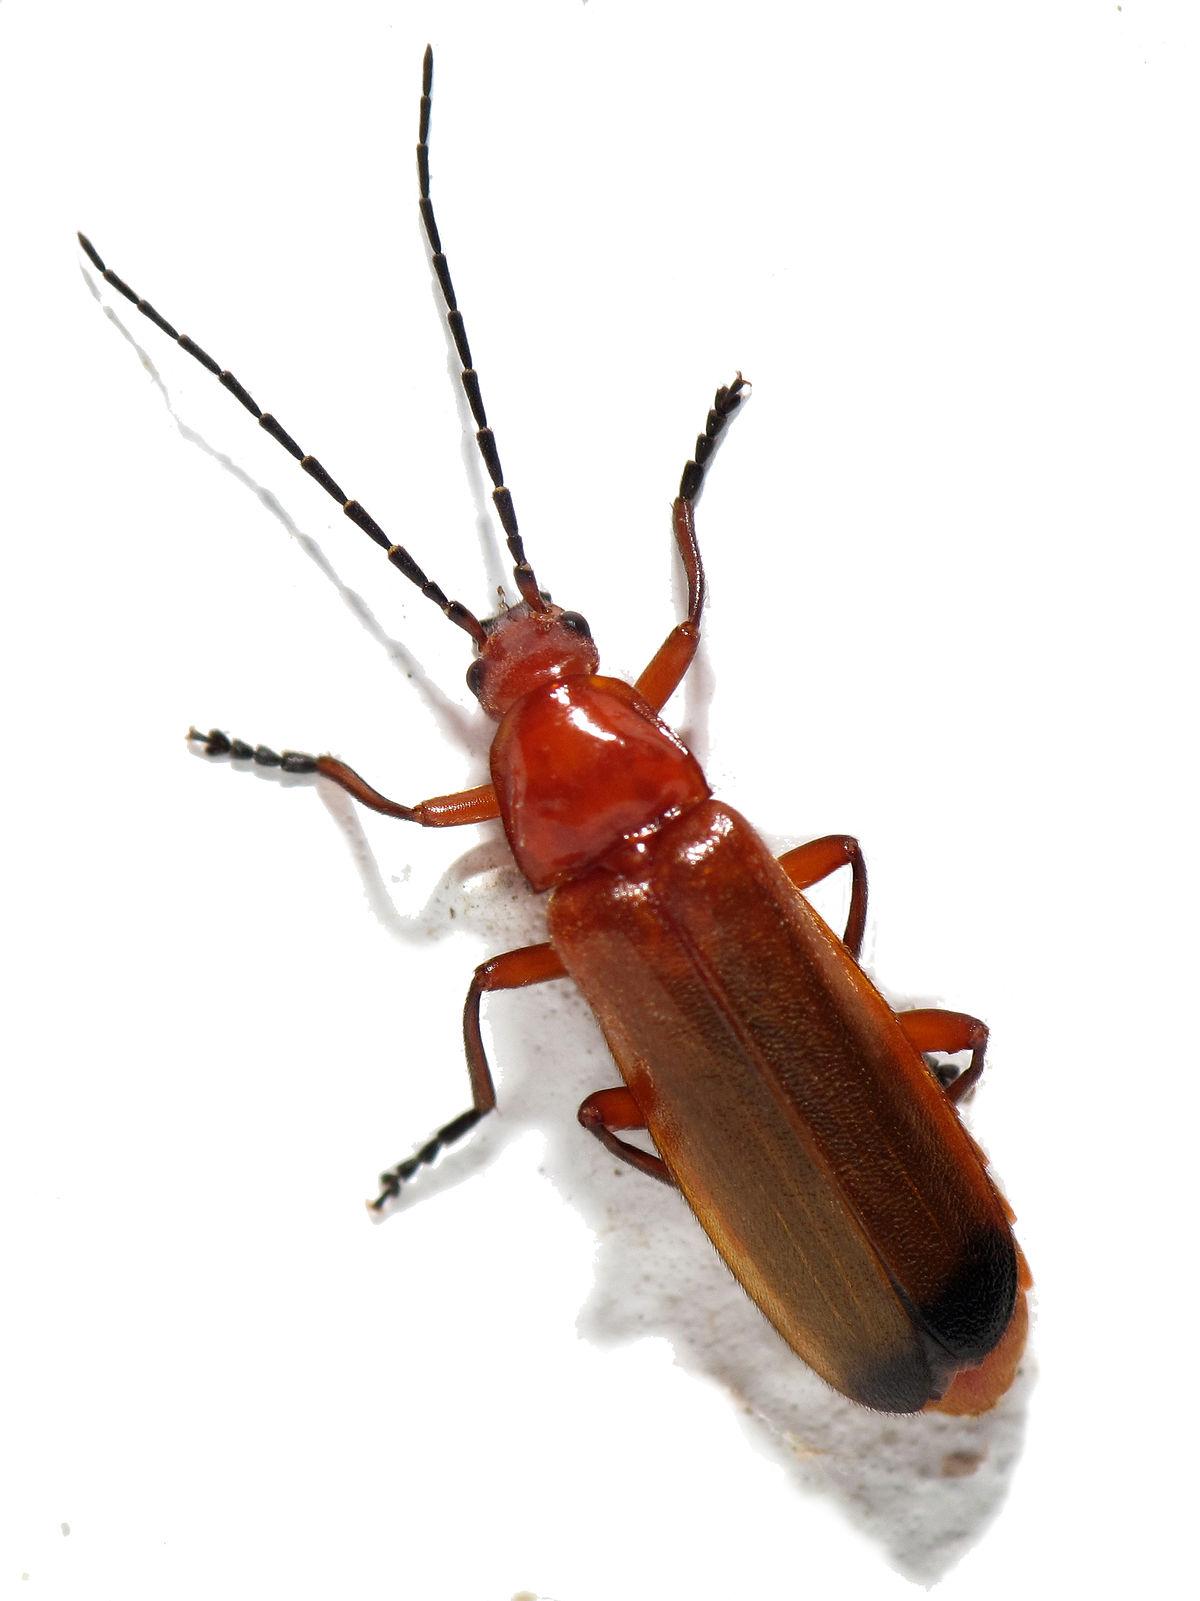 Soldier beetle photo